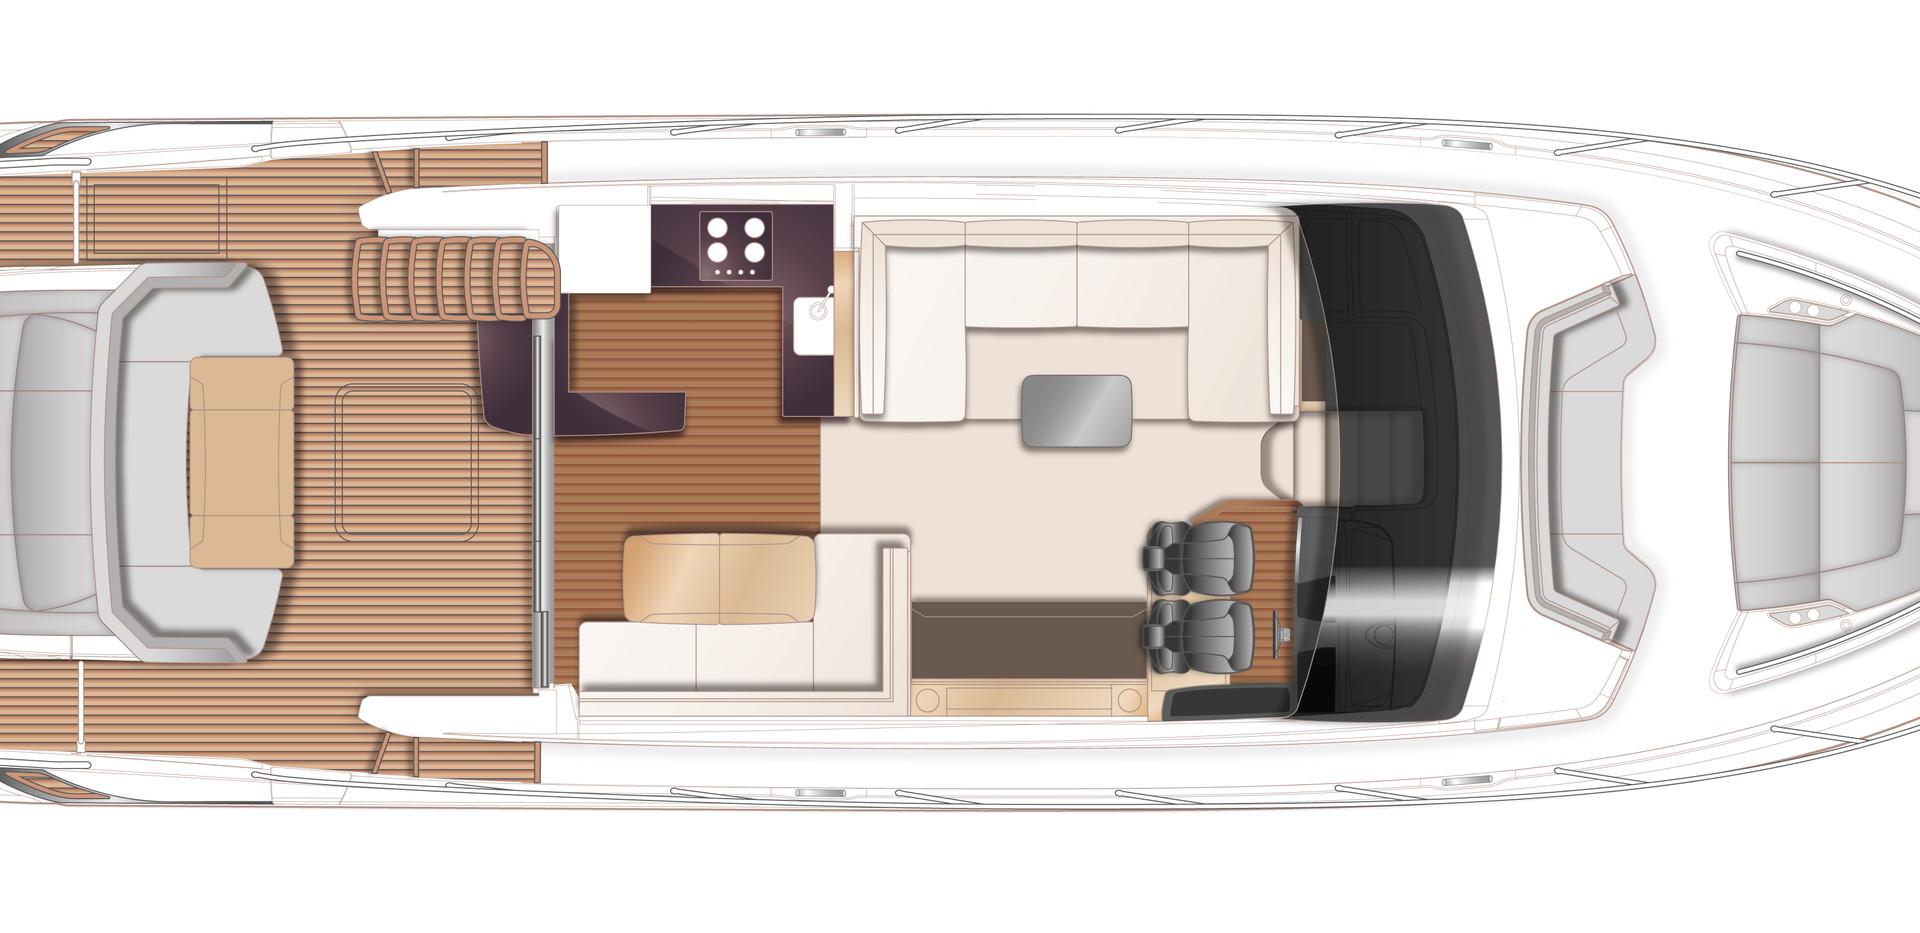 s62-layout-main-deck.jpg